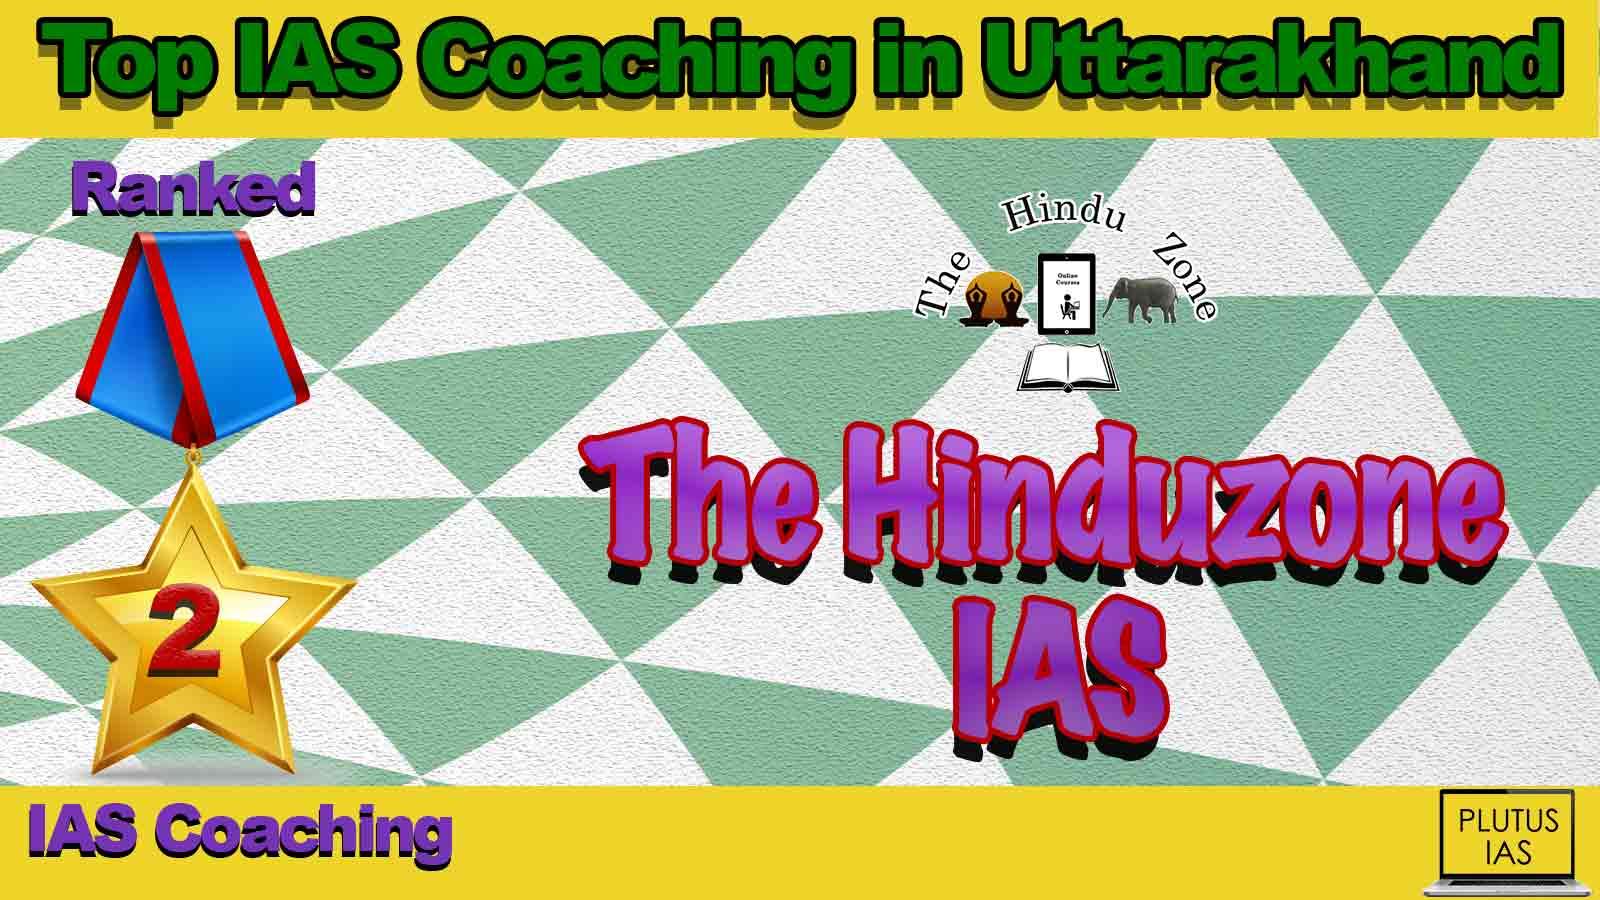 Best IAS Coaching in Uttarakhand